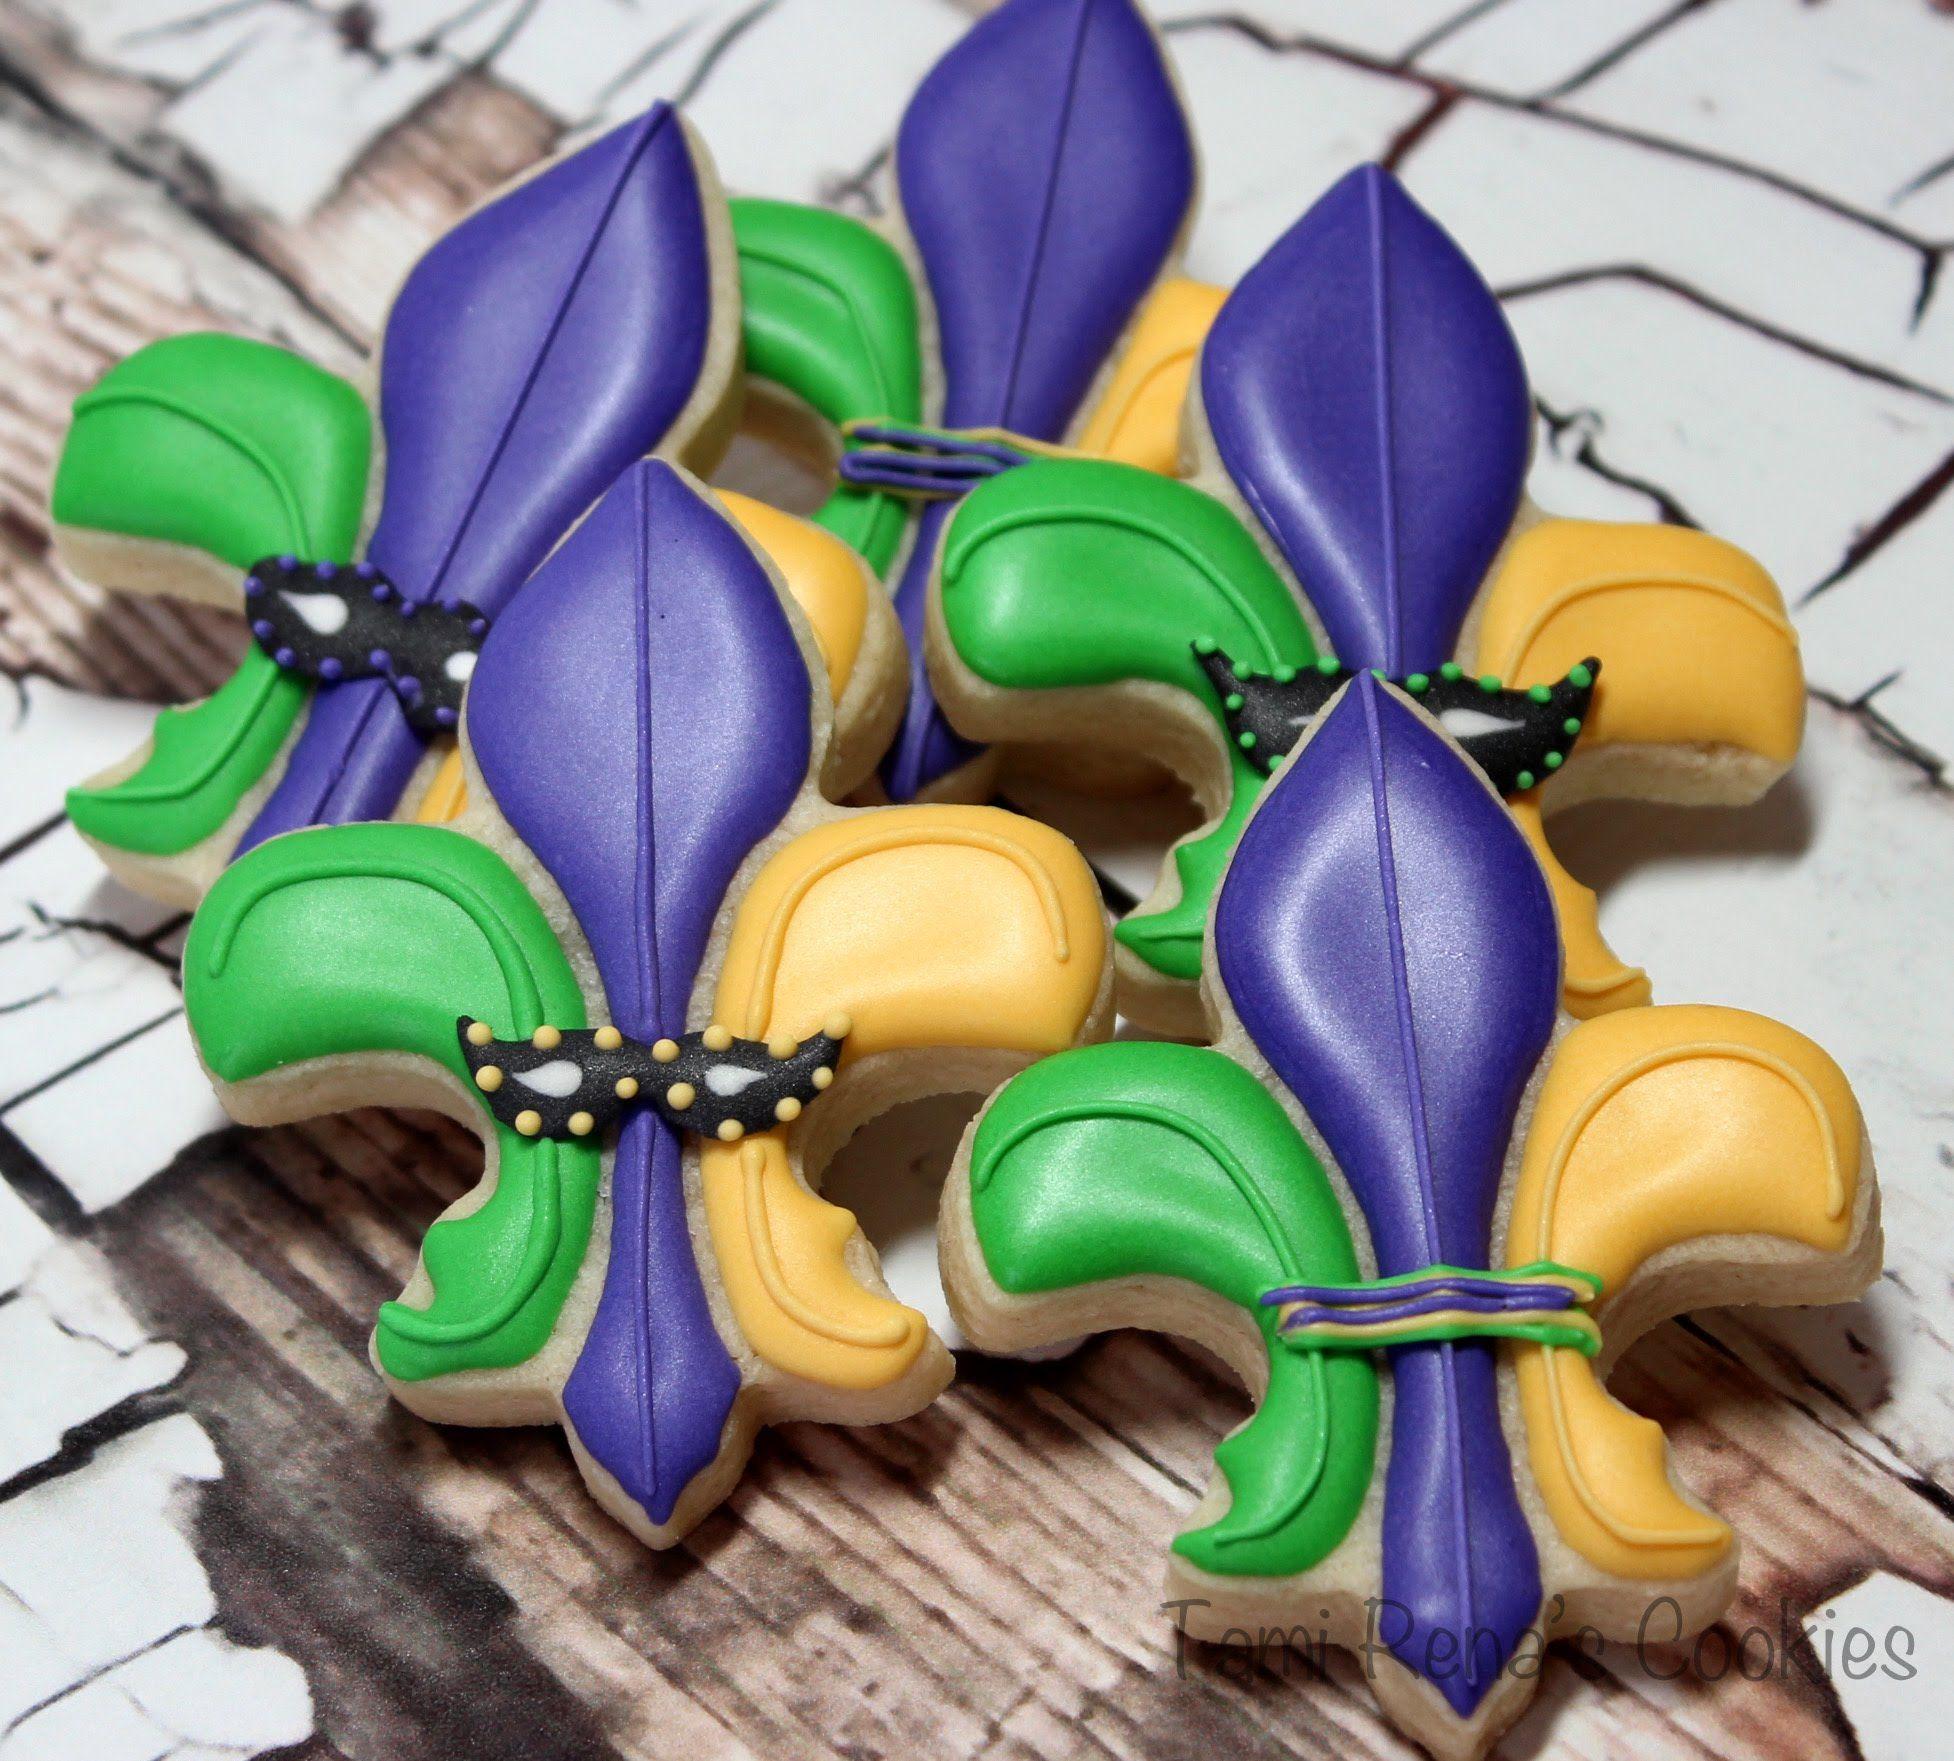 How to decorate a Fleur-de-lis for Mardi Gras